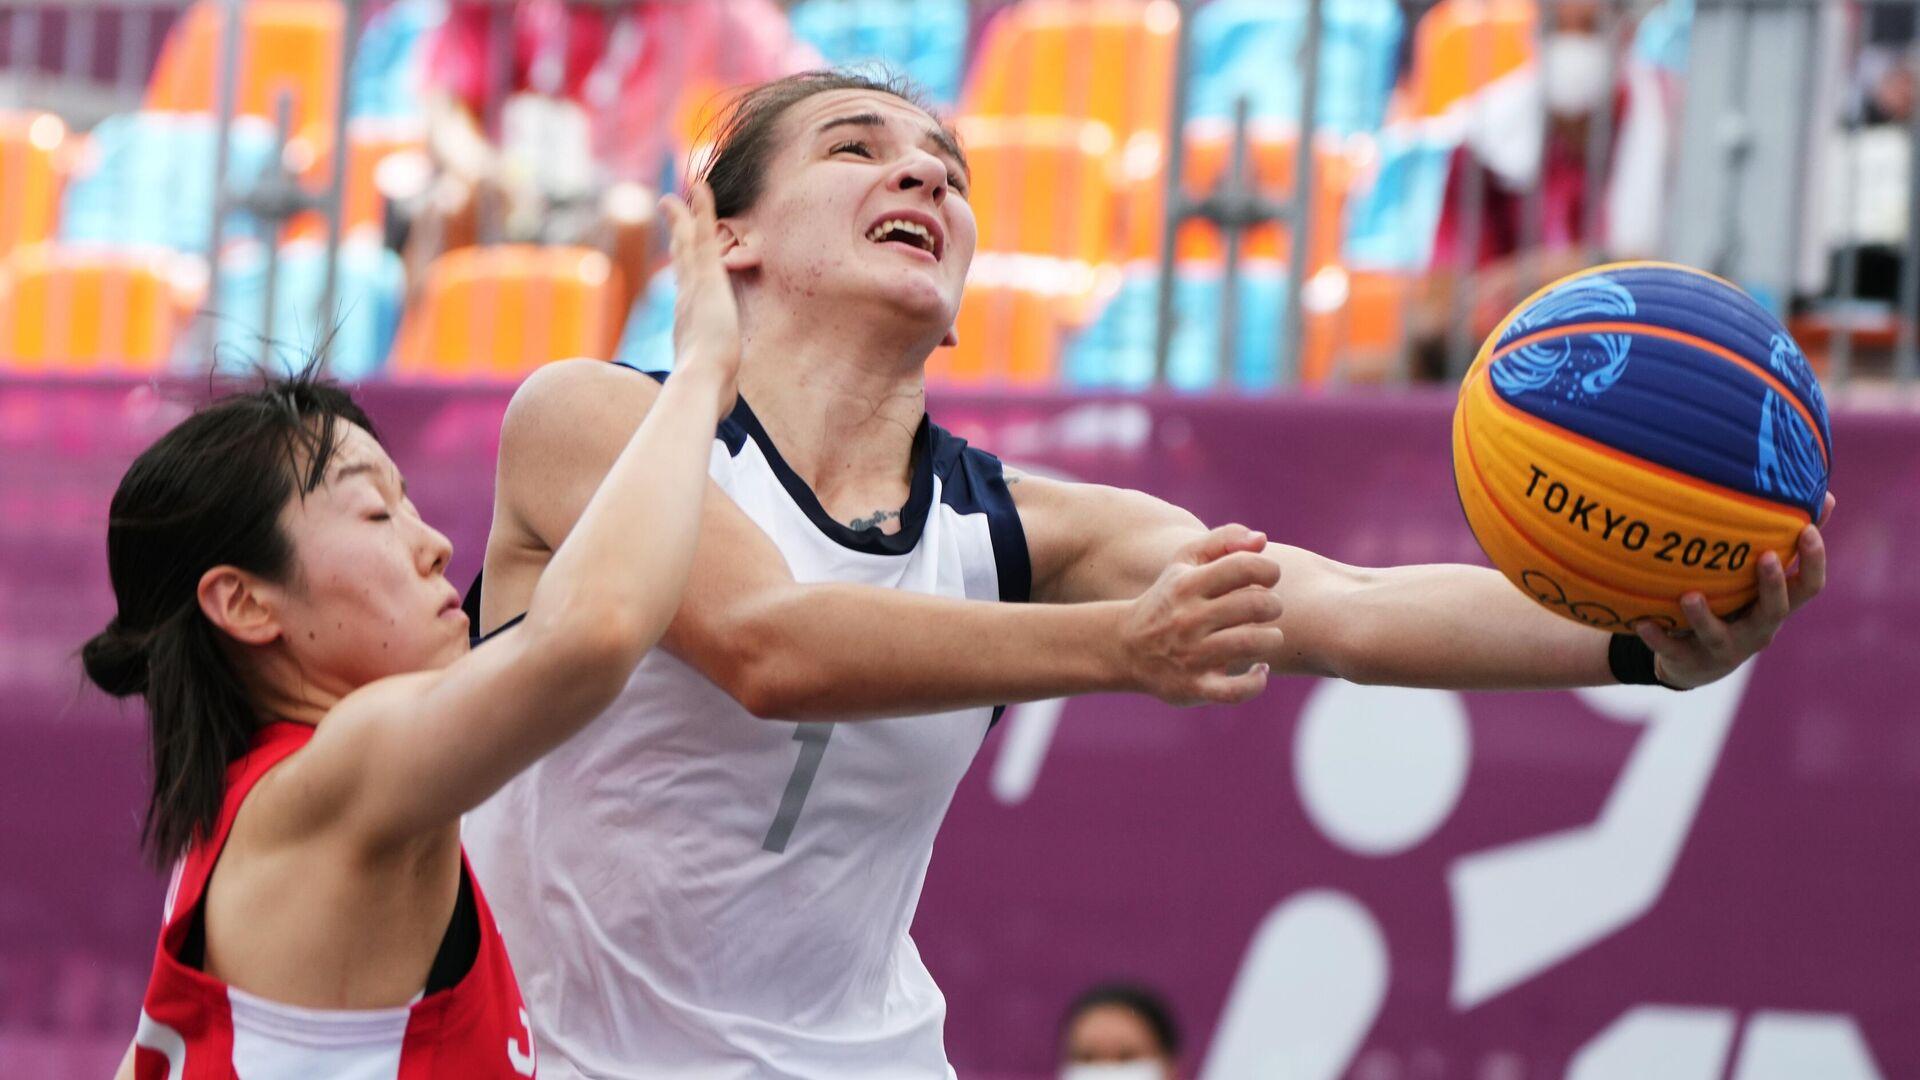 Олимпиада-2020. Баскетбол 3х3. Женщины. Матч Россия - Япония - РИА Новости, 1920, 24.07.2021